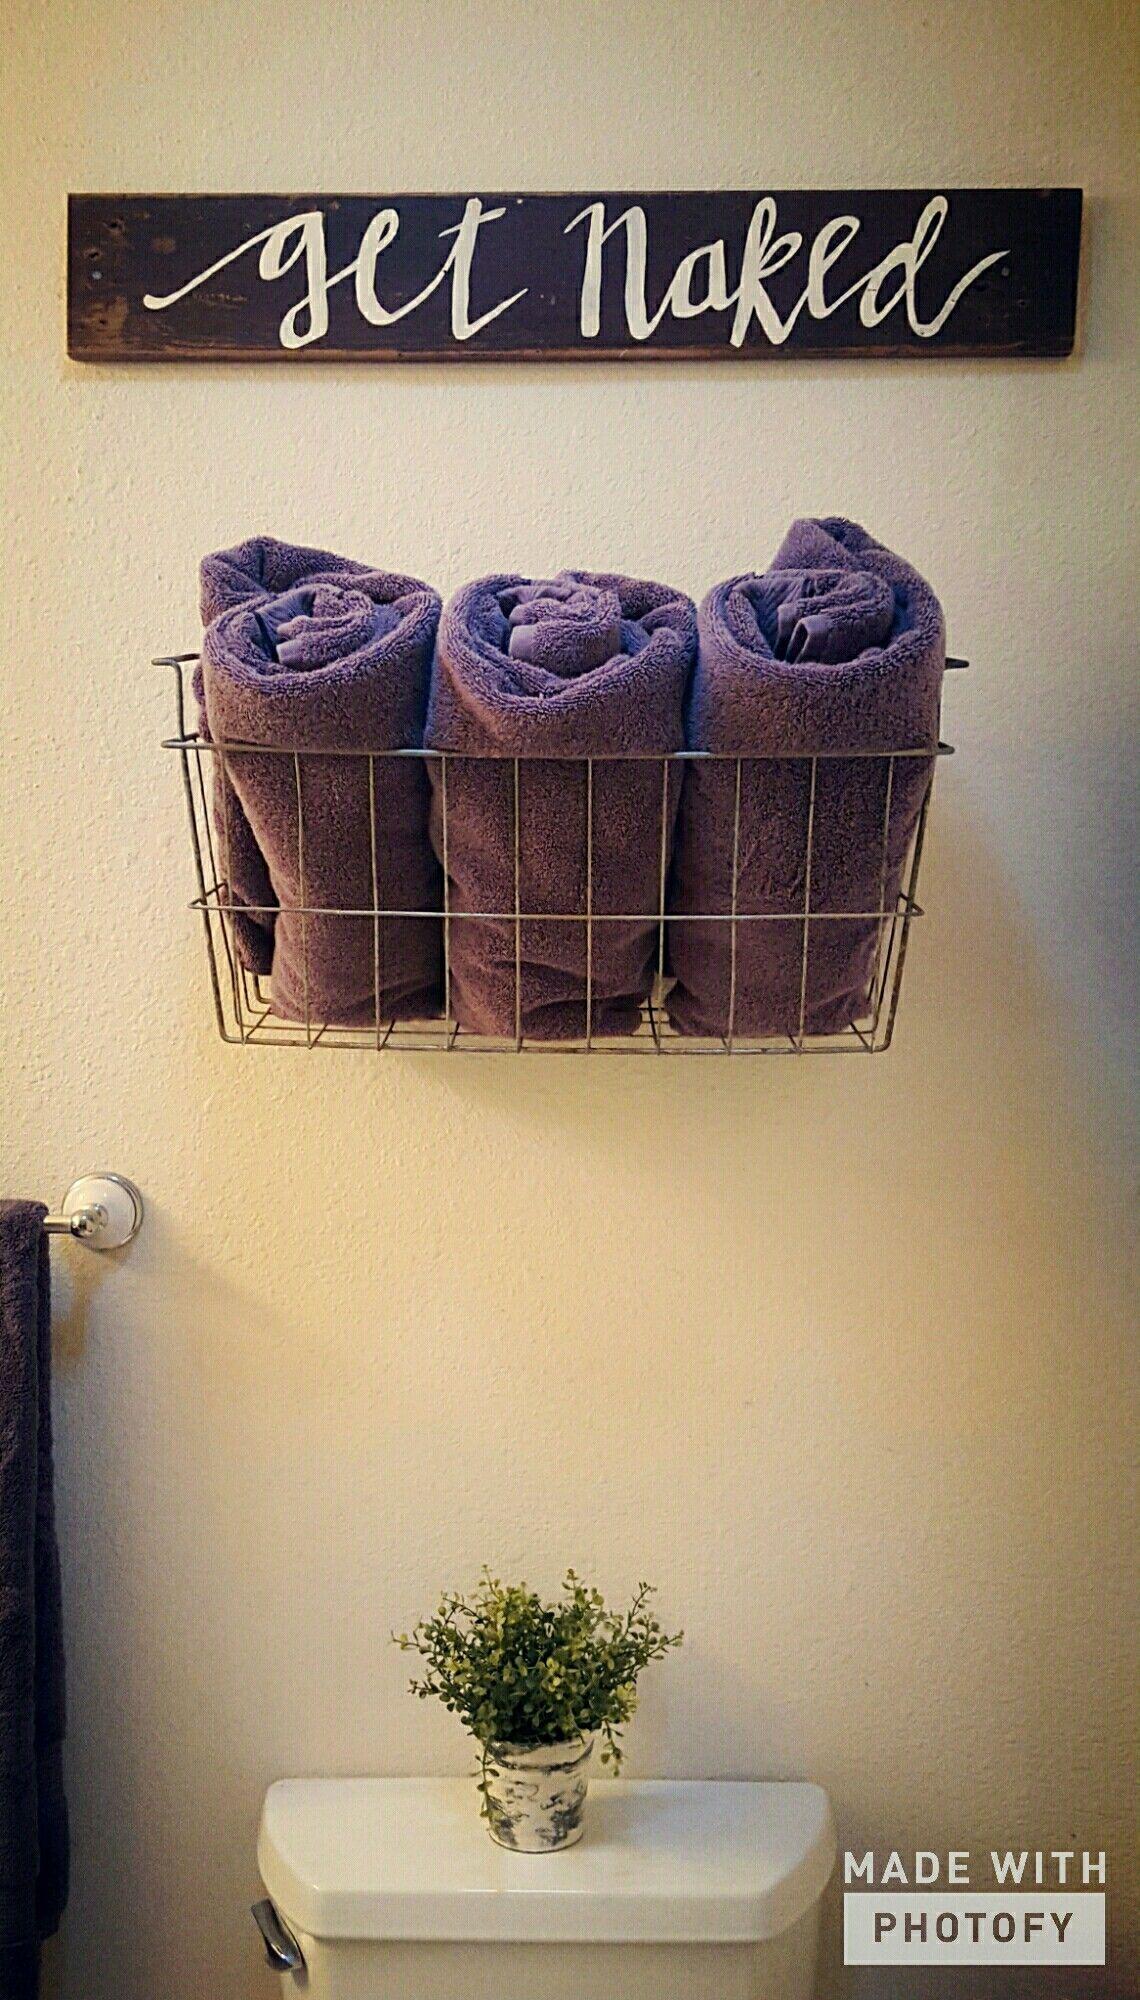 Get naked bath decor #diy #handmade #kaylynnskreations | Herriman ...